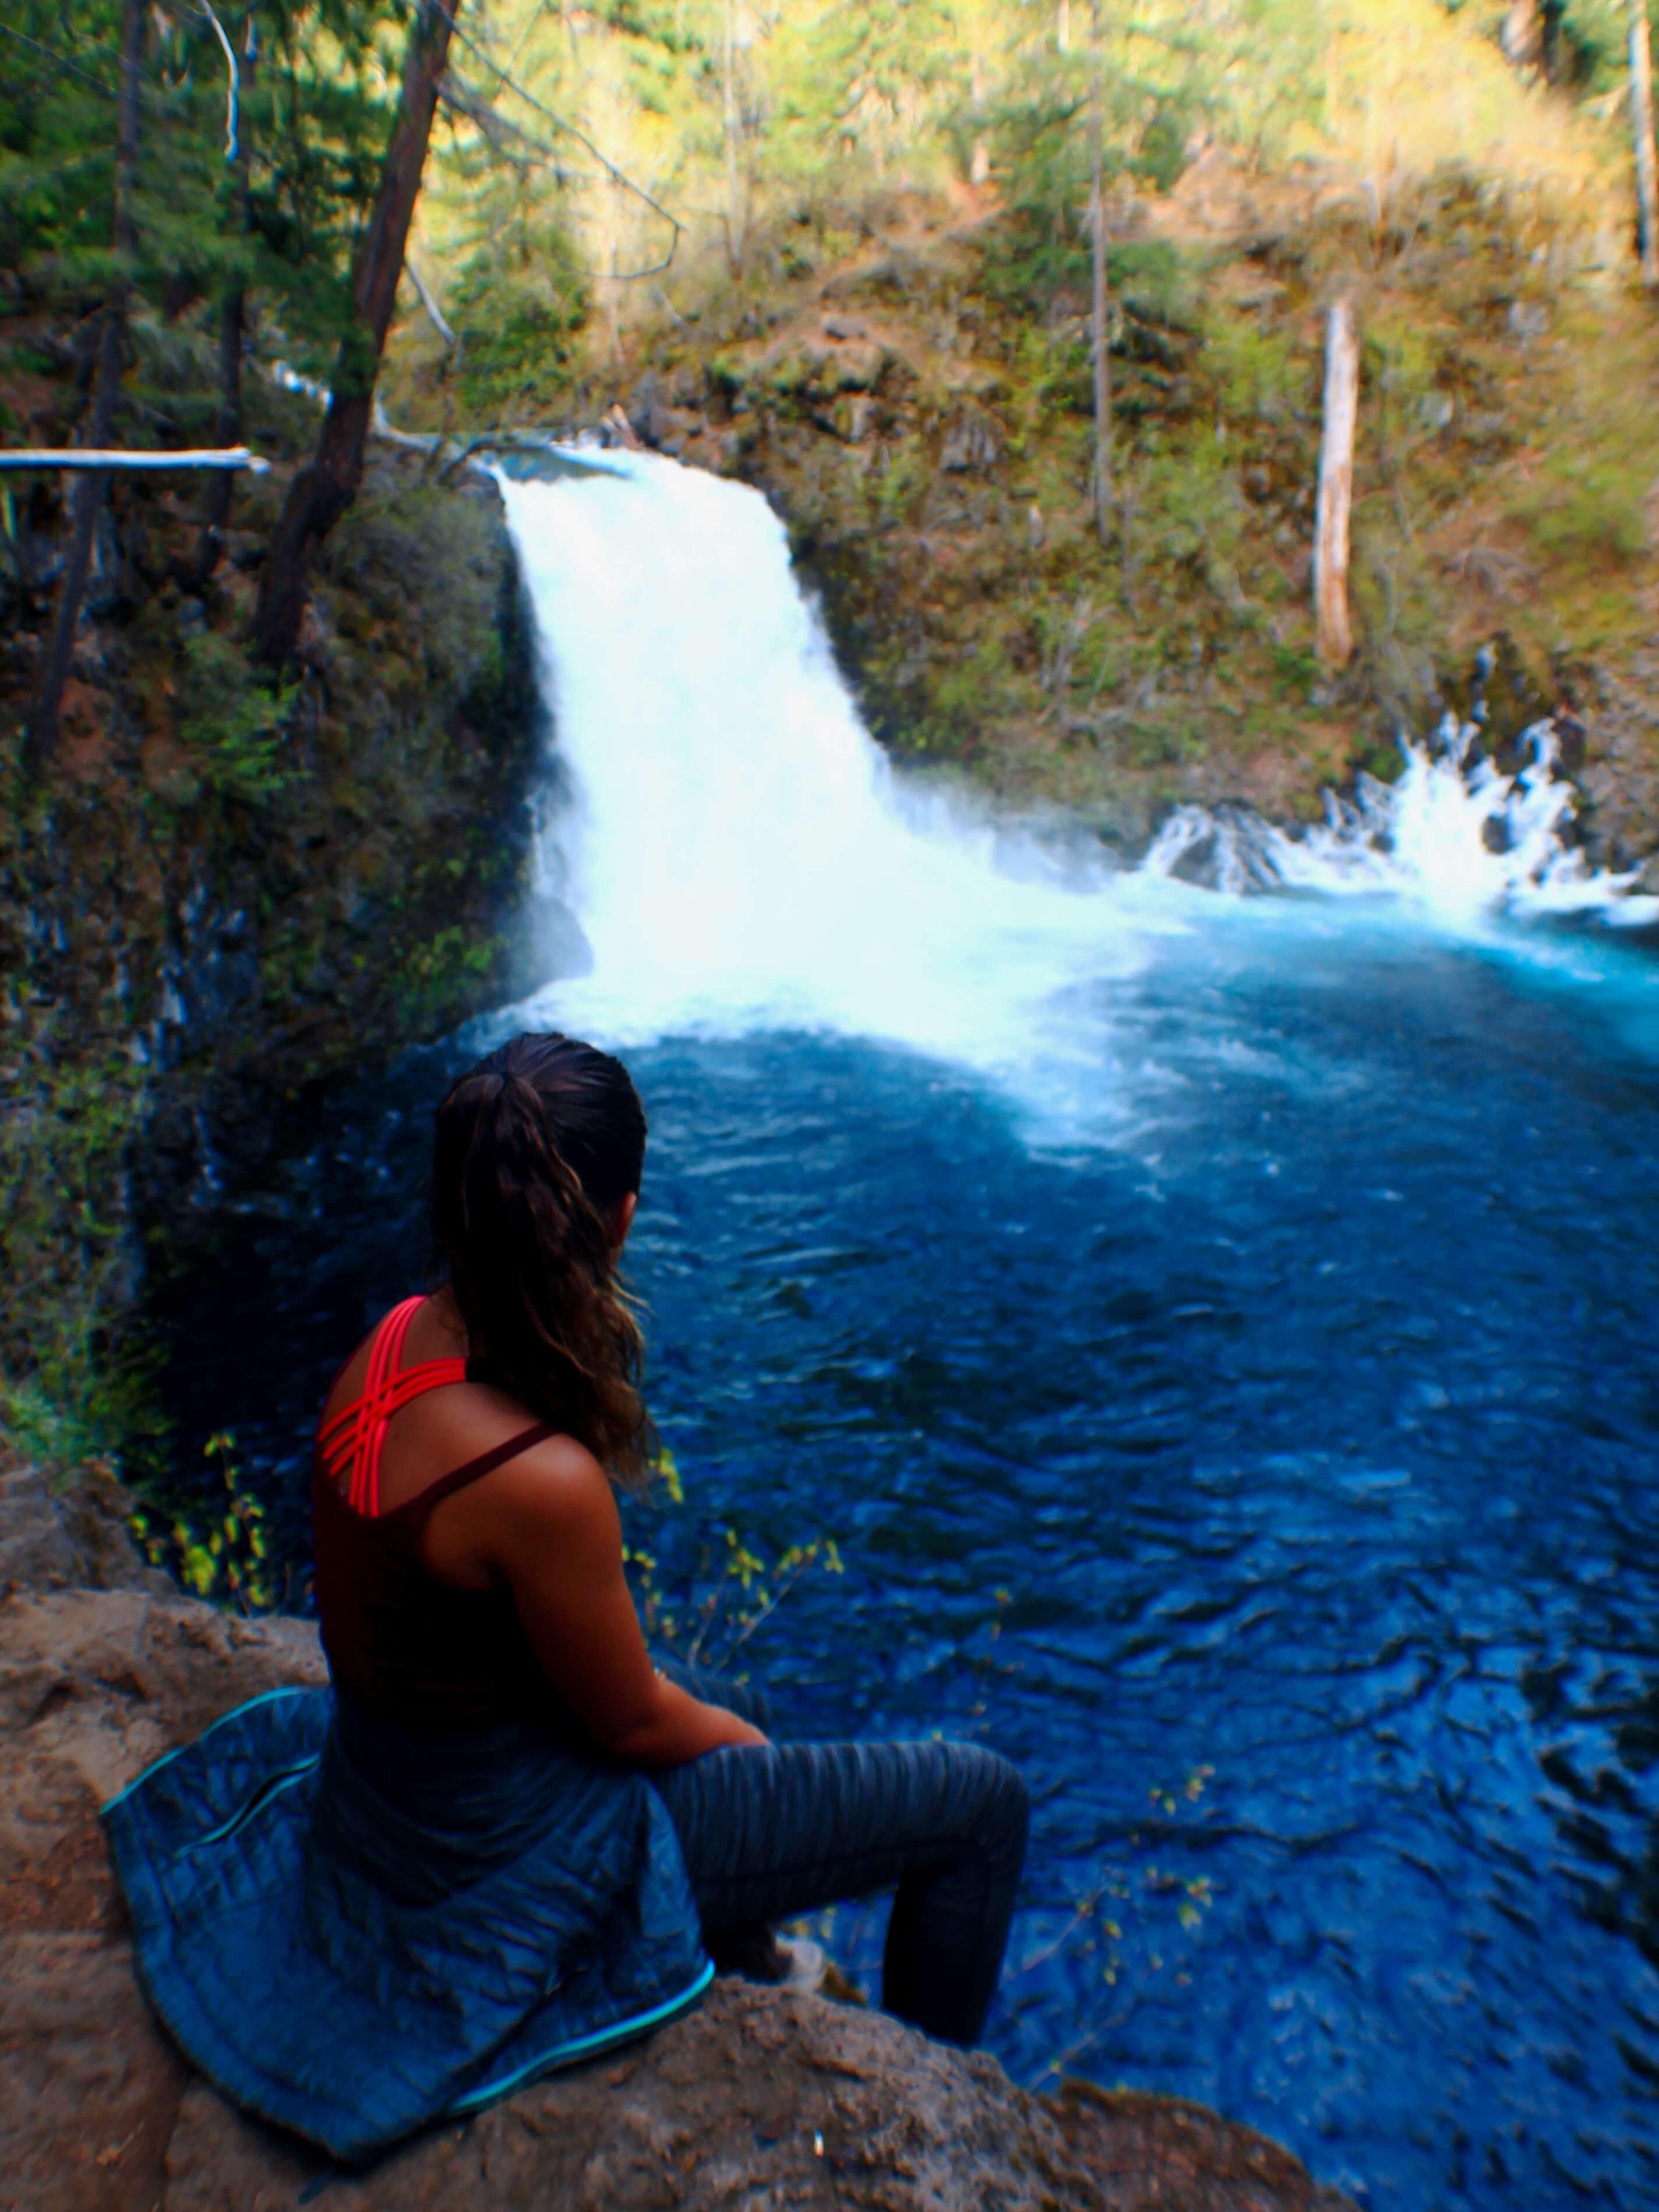 Best Hike in the PNW- hiking to Blue Pools, Mackenzie Highway